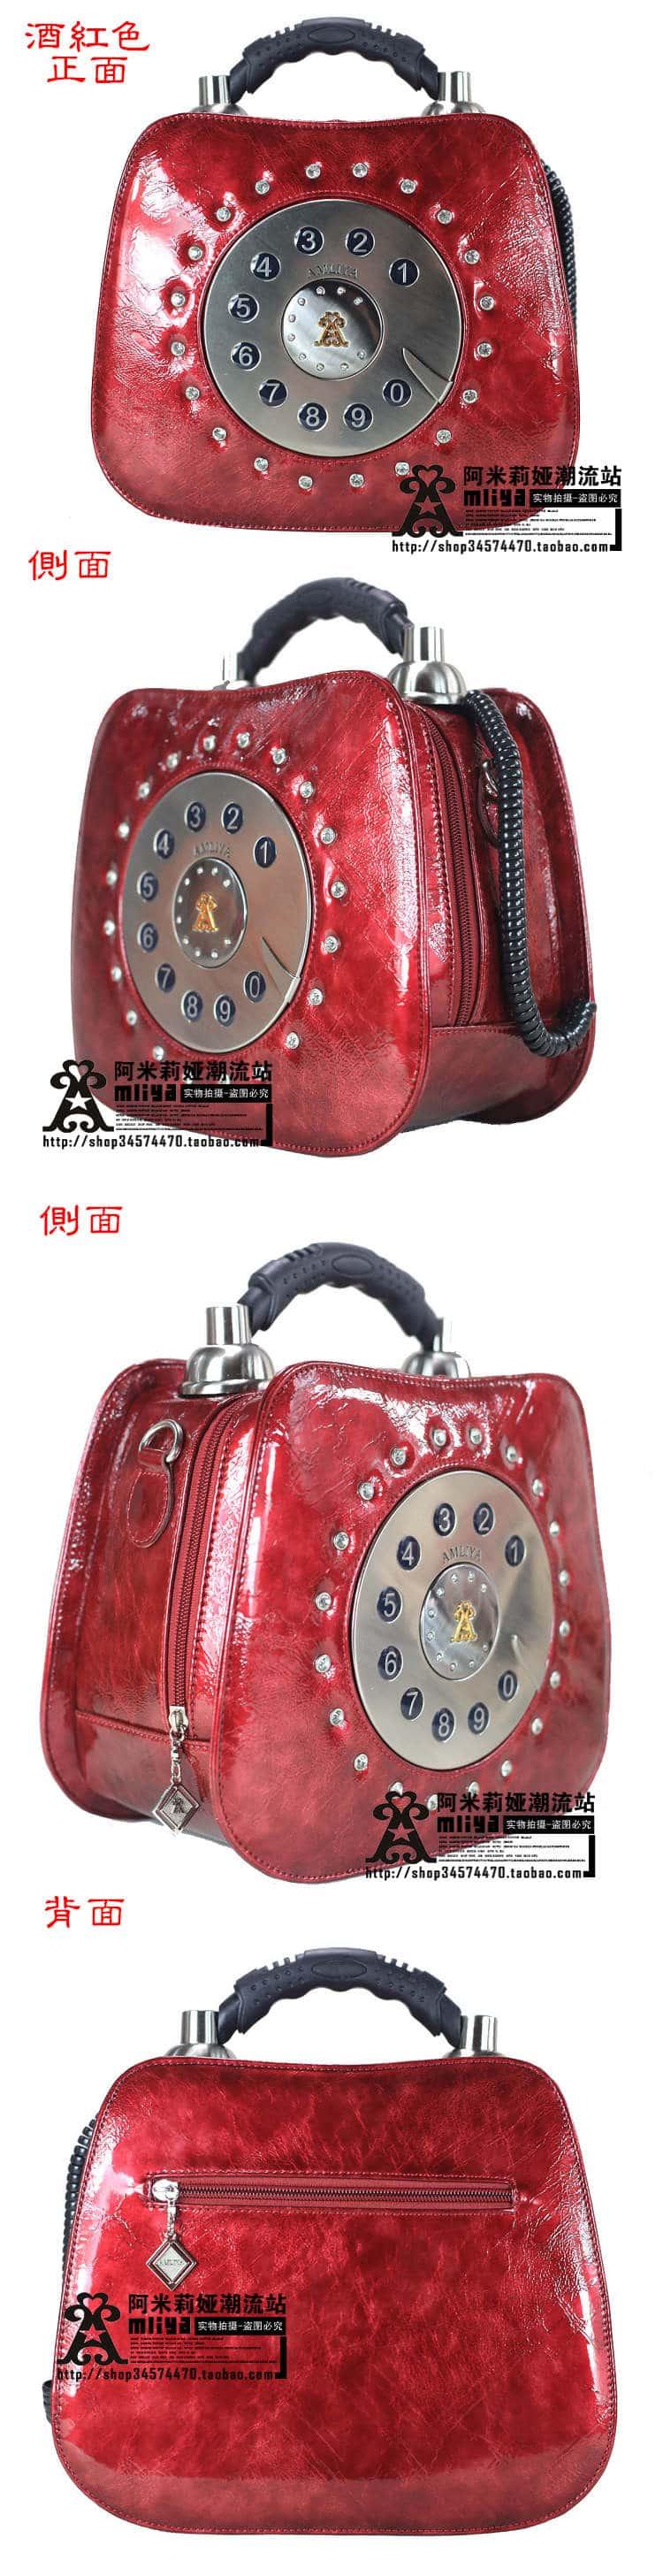 working-telephone-bag-1970s